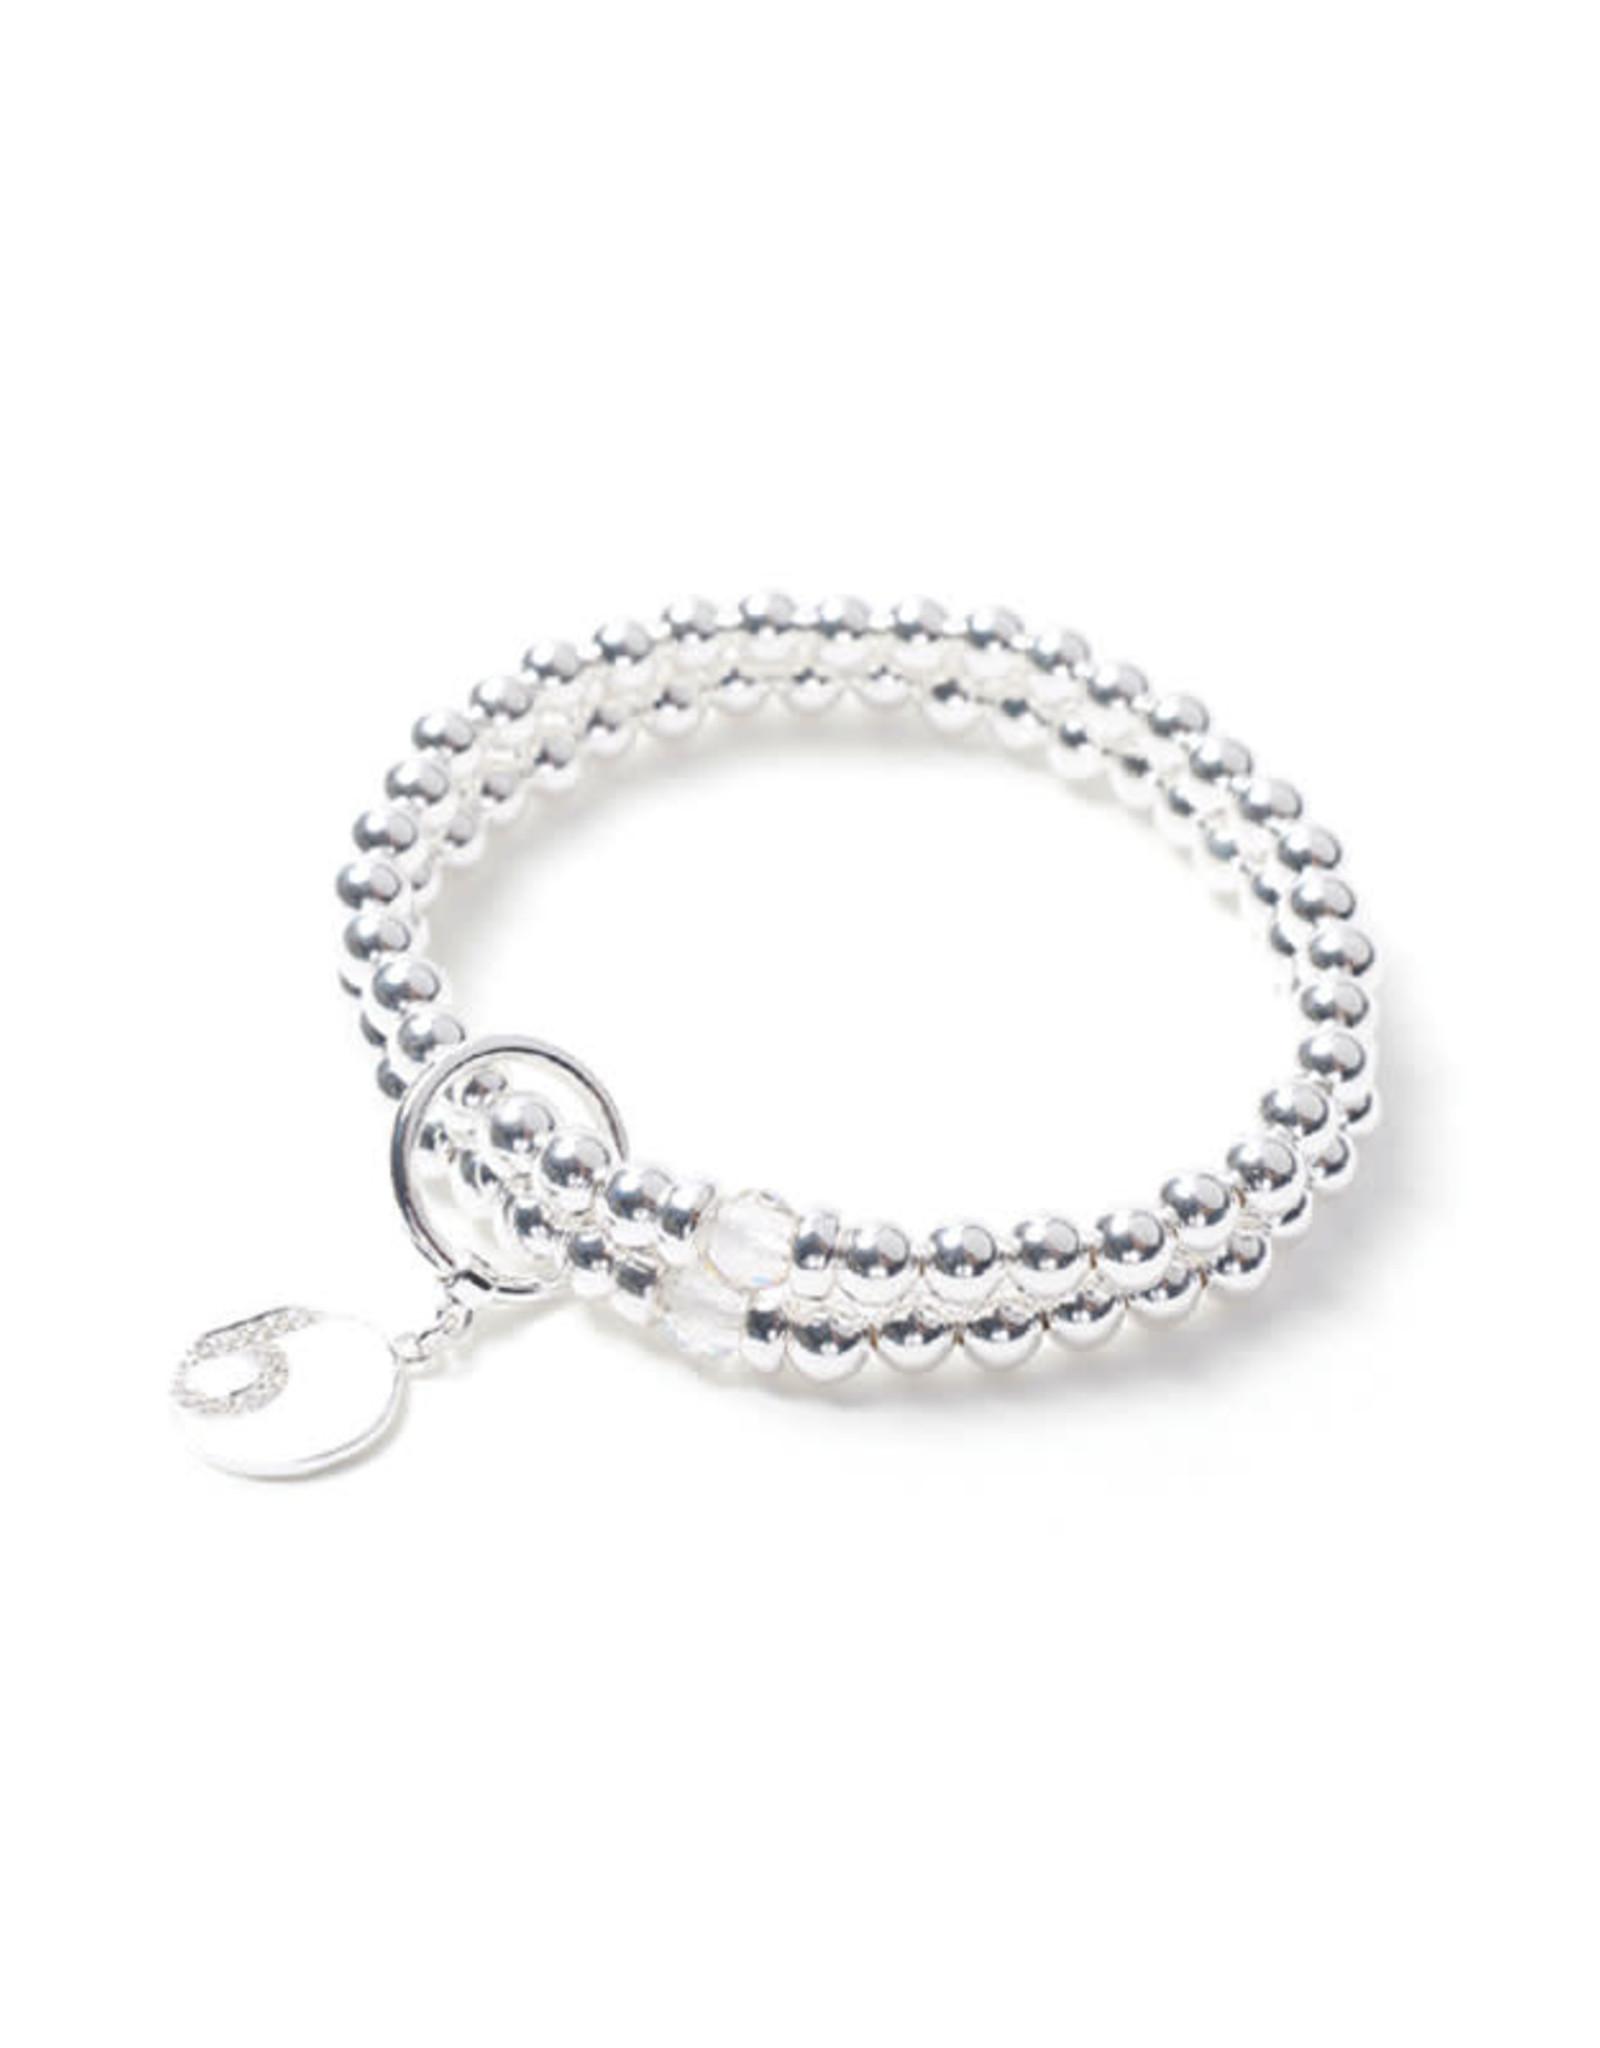 Beblue Bracelet  - Be Razzled- Dazzled argent